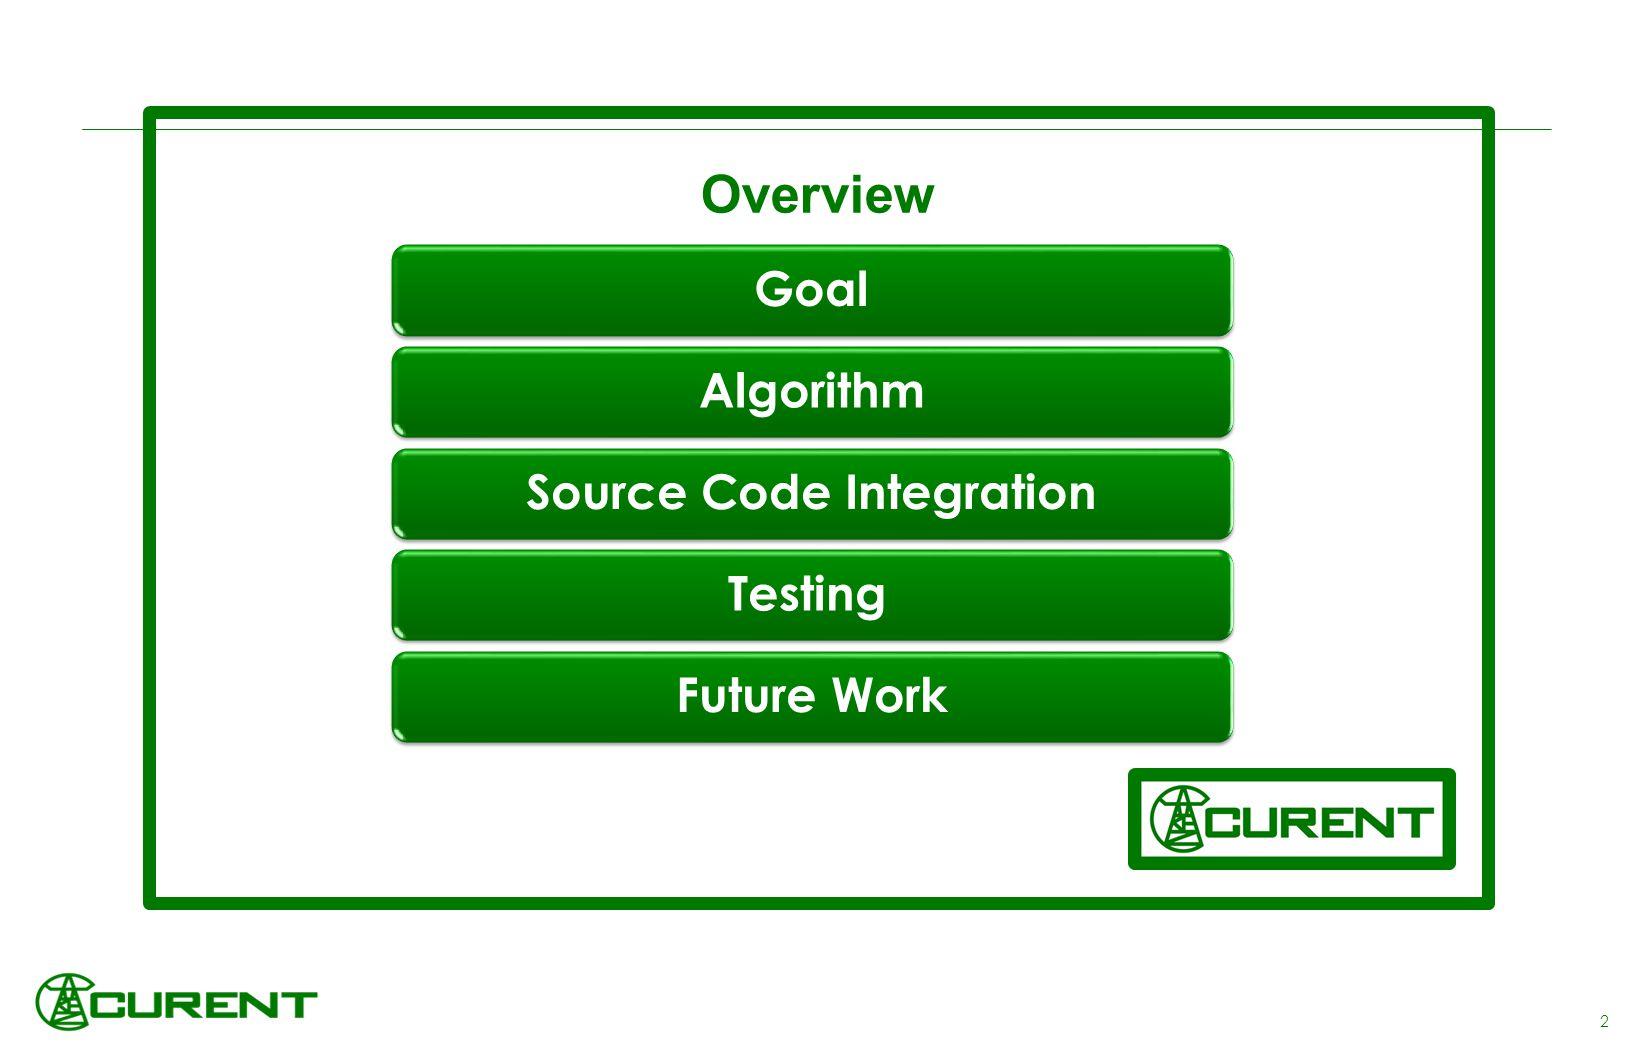 Overview 2 GoalAlgorithmSource Code IntegrationTestingFuture Work